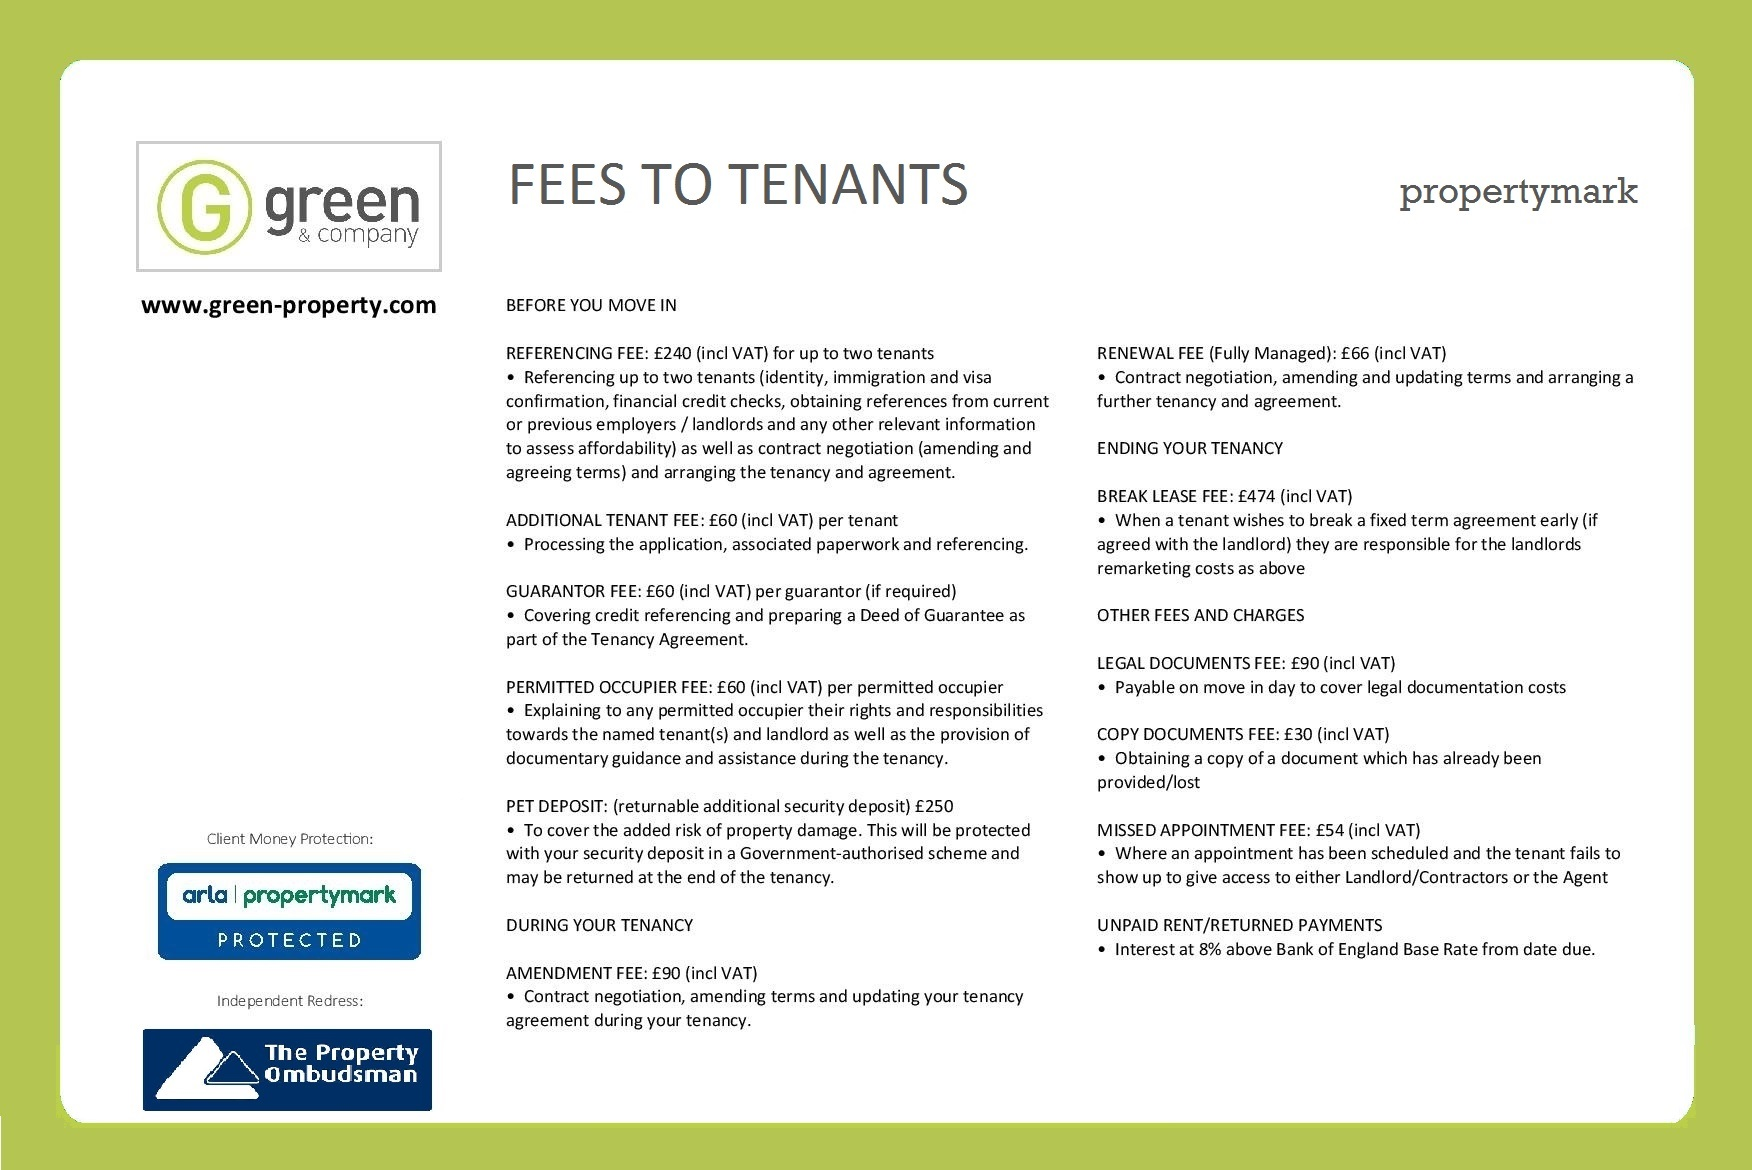 Fees for landlords